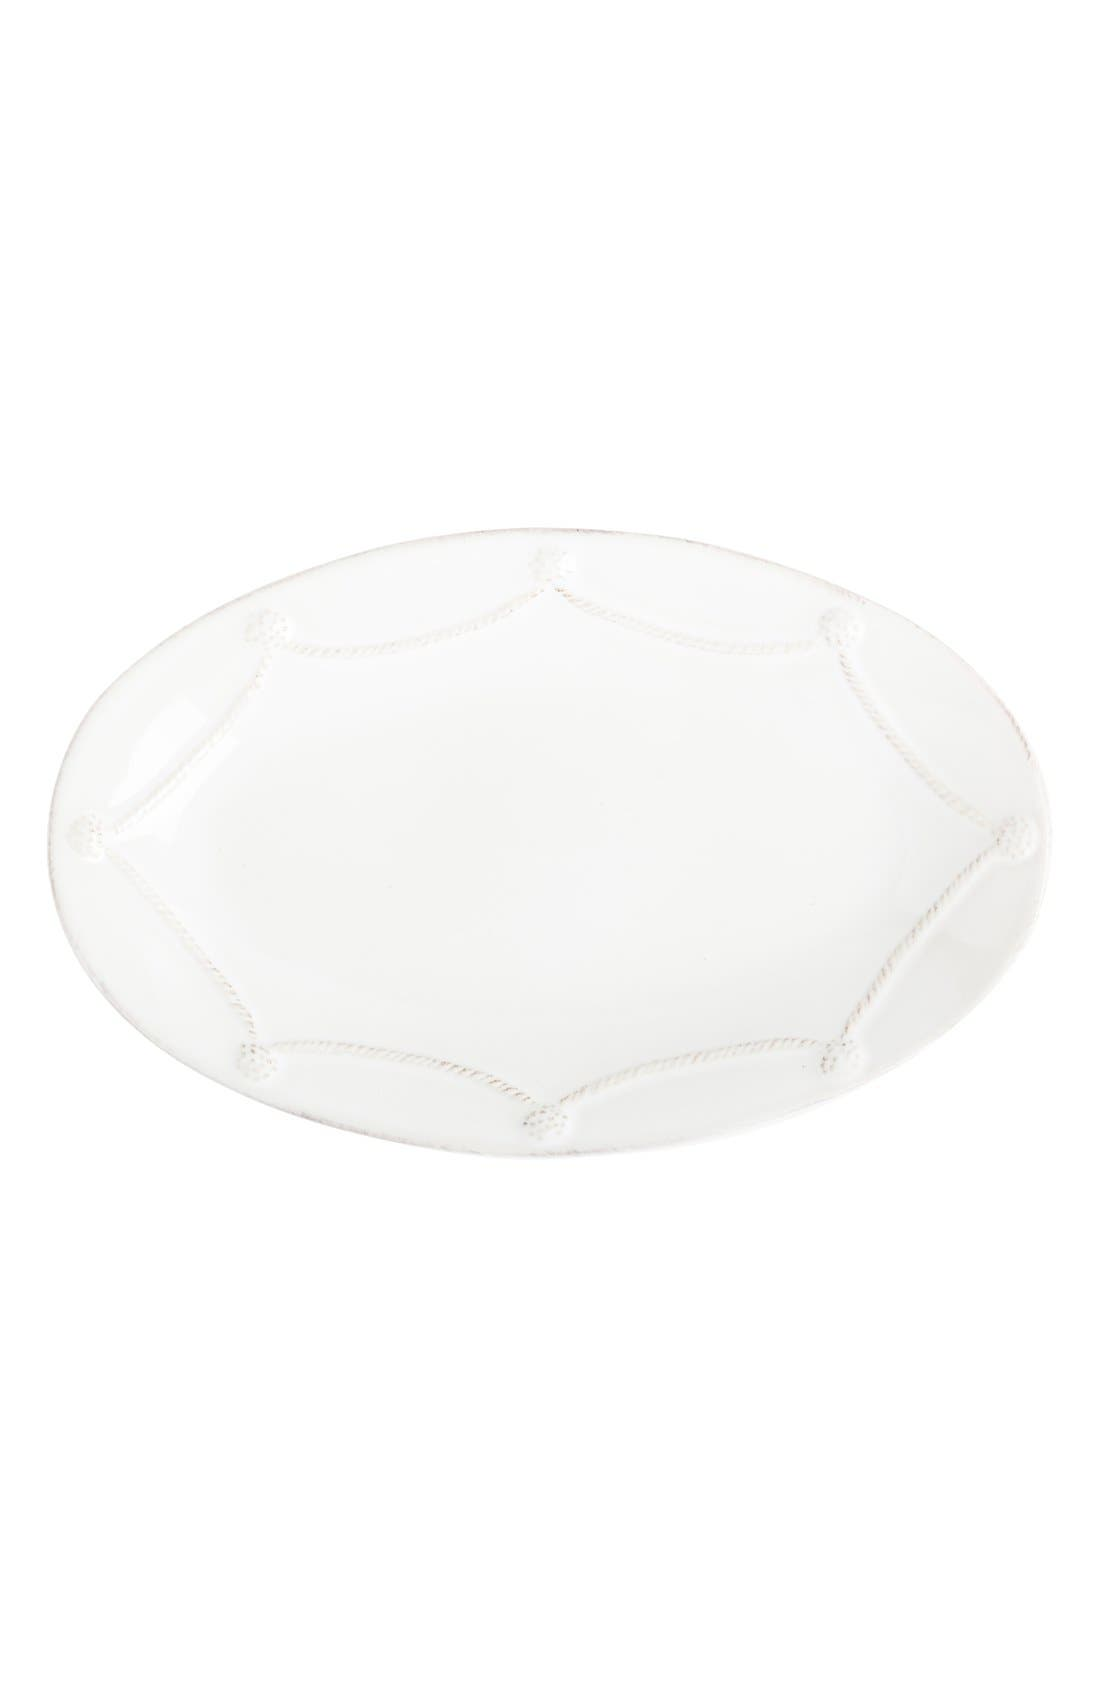 Main Image - Juliska'Berry and Thread' Oval Platter